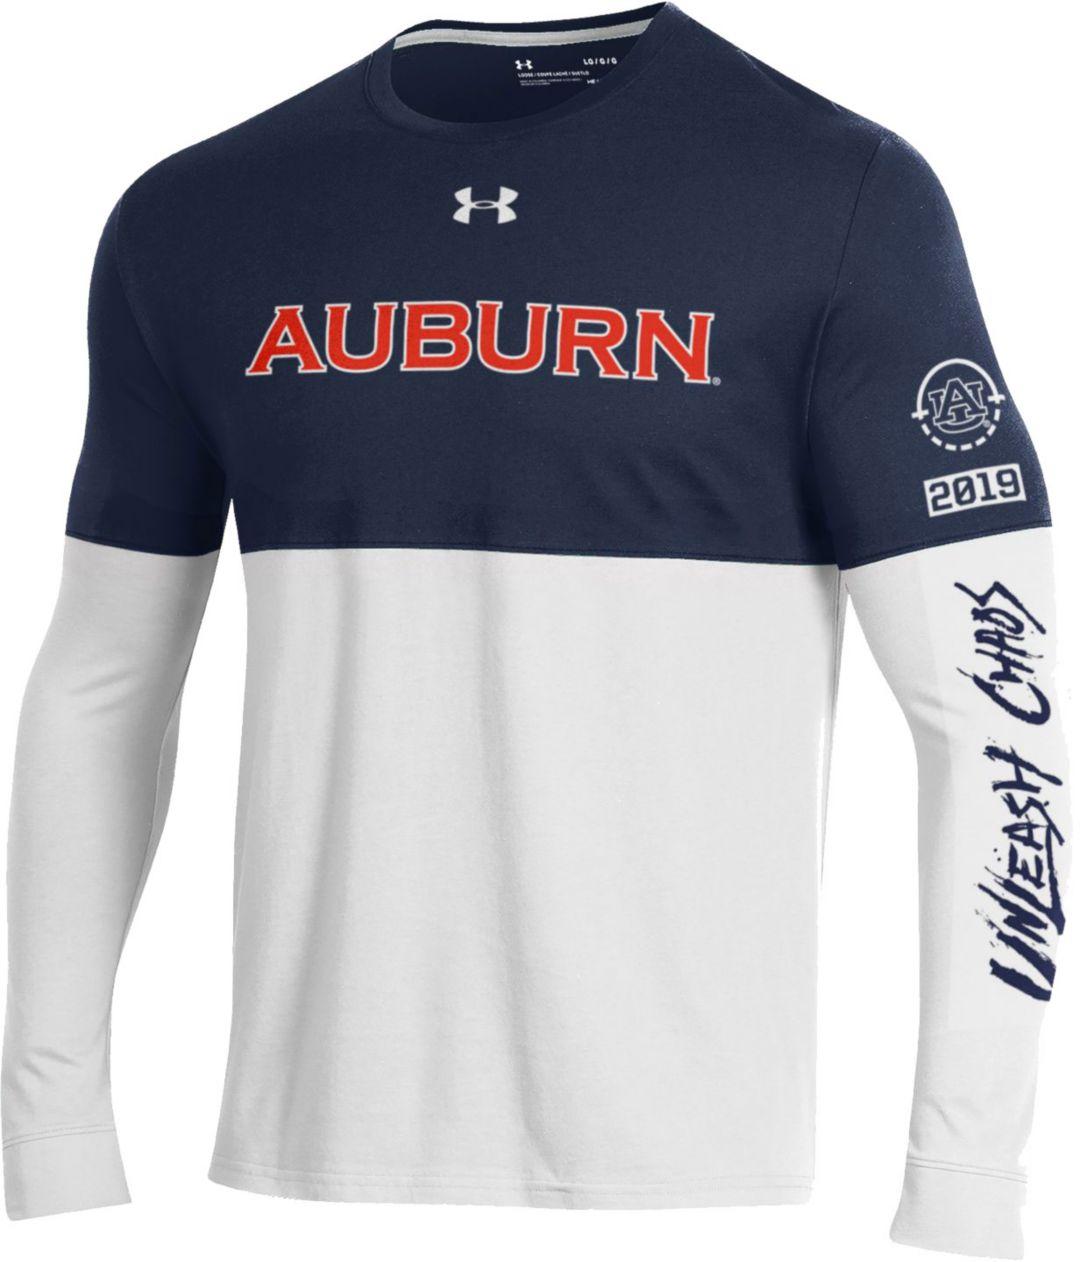 buy online 852c2 b658b Under Armour Men's Auburn Tigers Blue/White 'Unleash Chaos' Bench Long  Sleeve Basketball T-Shirt